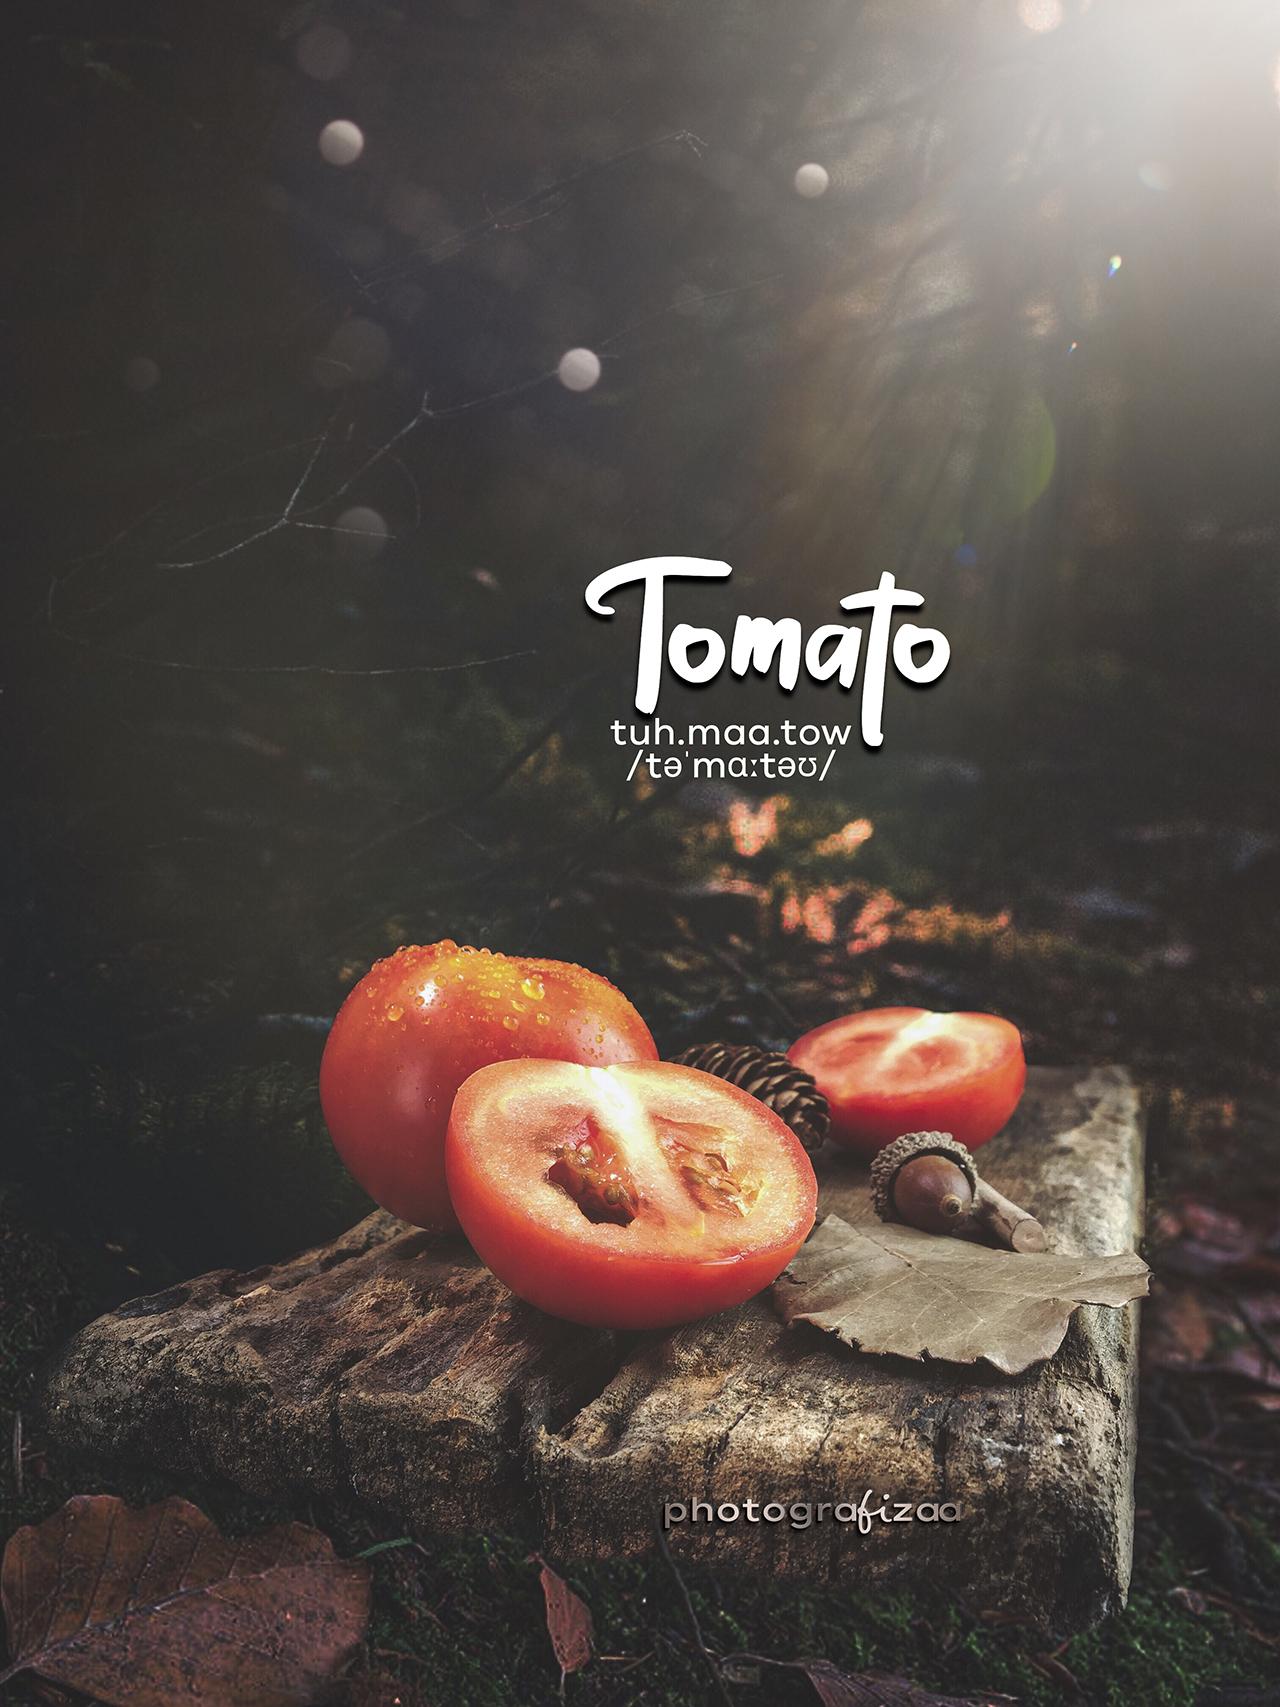 Tomato Photography Jungle Theme-Photografizaa